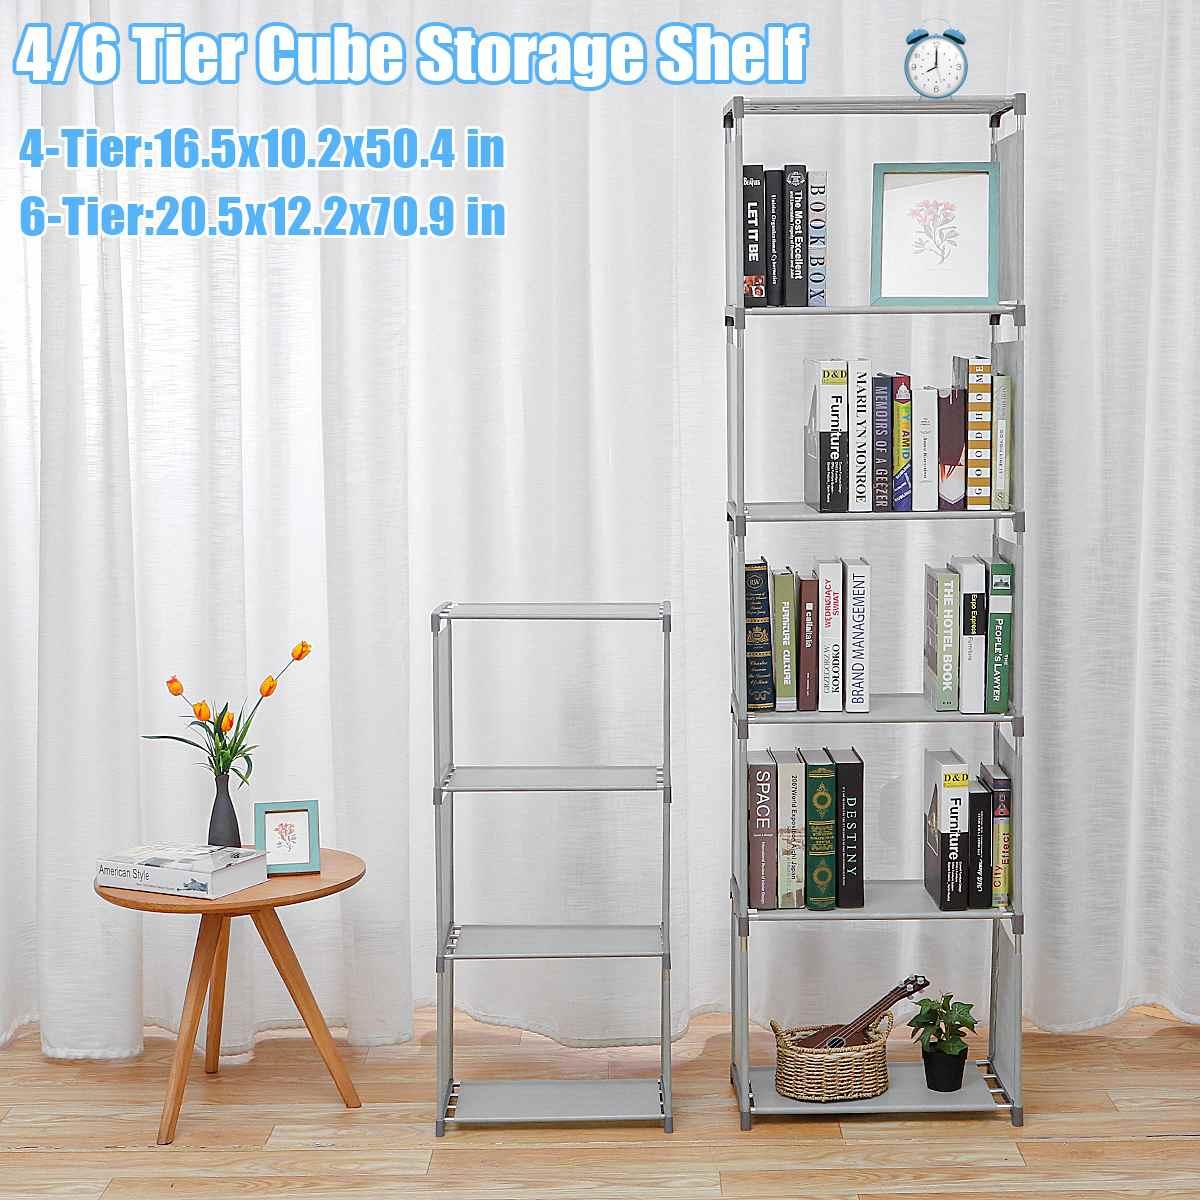 4/6Tier Cube Bookshelf Storage Shelves Standing Cabinet Display Rack Room DIY Organizer Office Household Bookcase Home Furniture